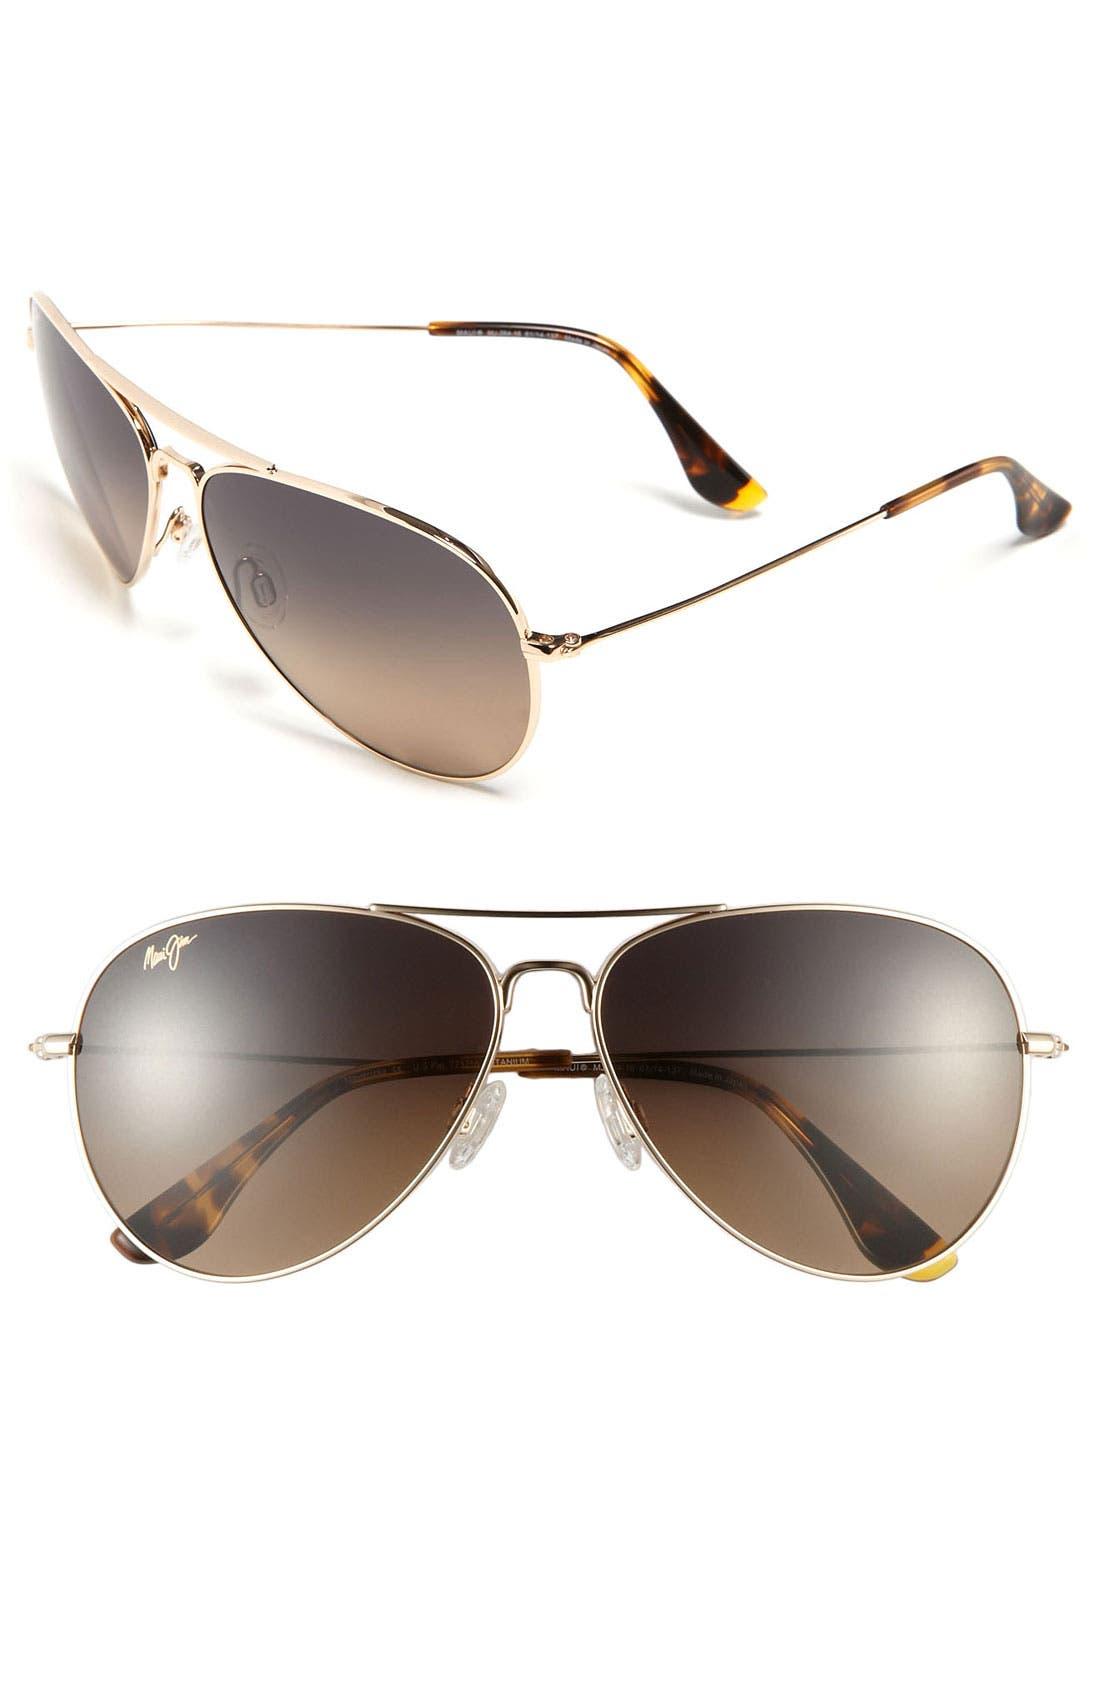 Maui Jim Mavericks 61mm PolarizedPlus2® Aviator Sunglasses